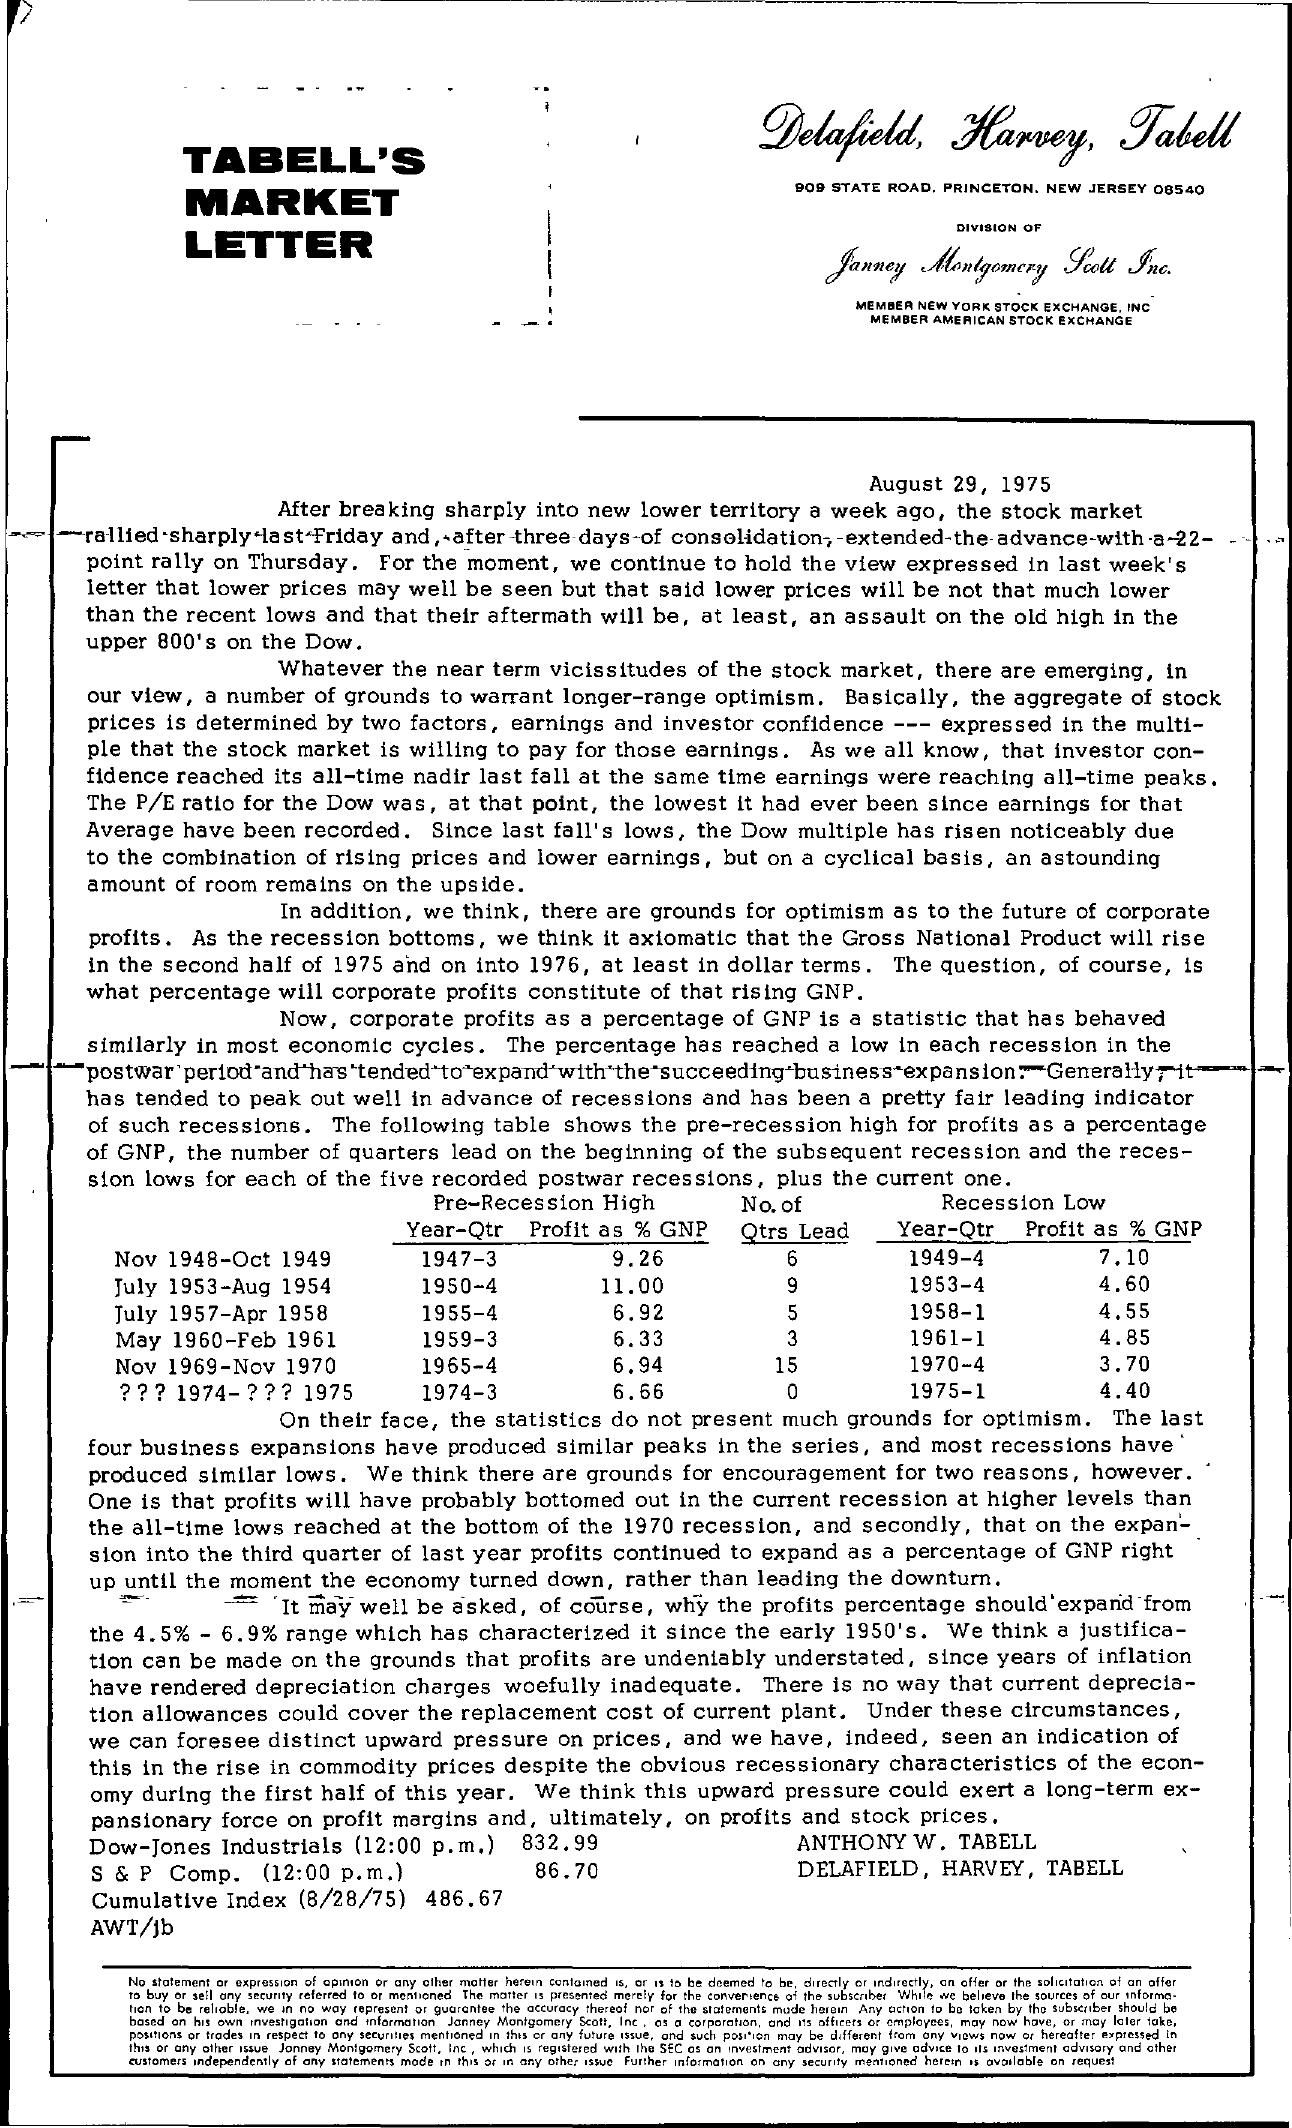 Tabell's Market Letter - August 29, 1975